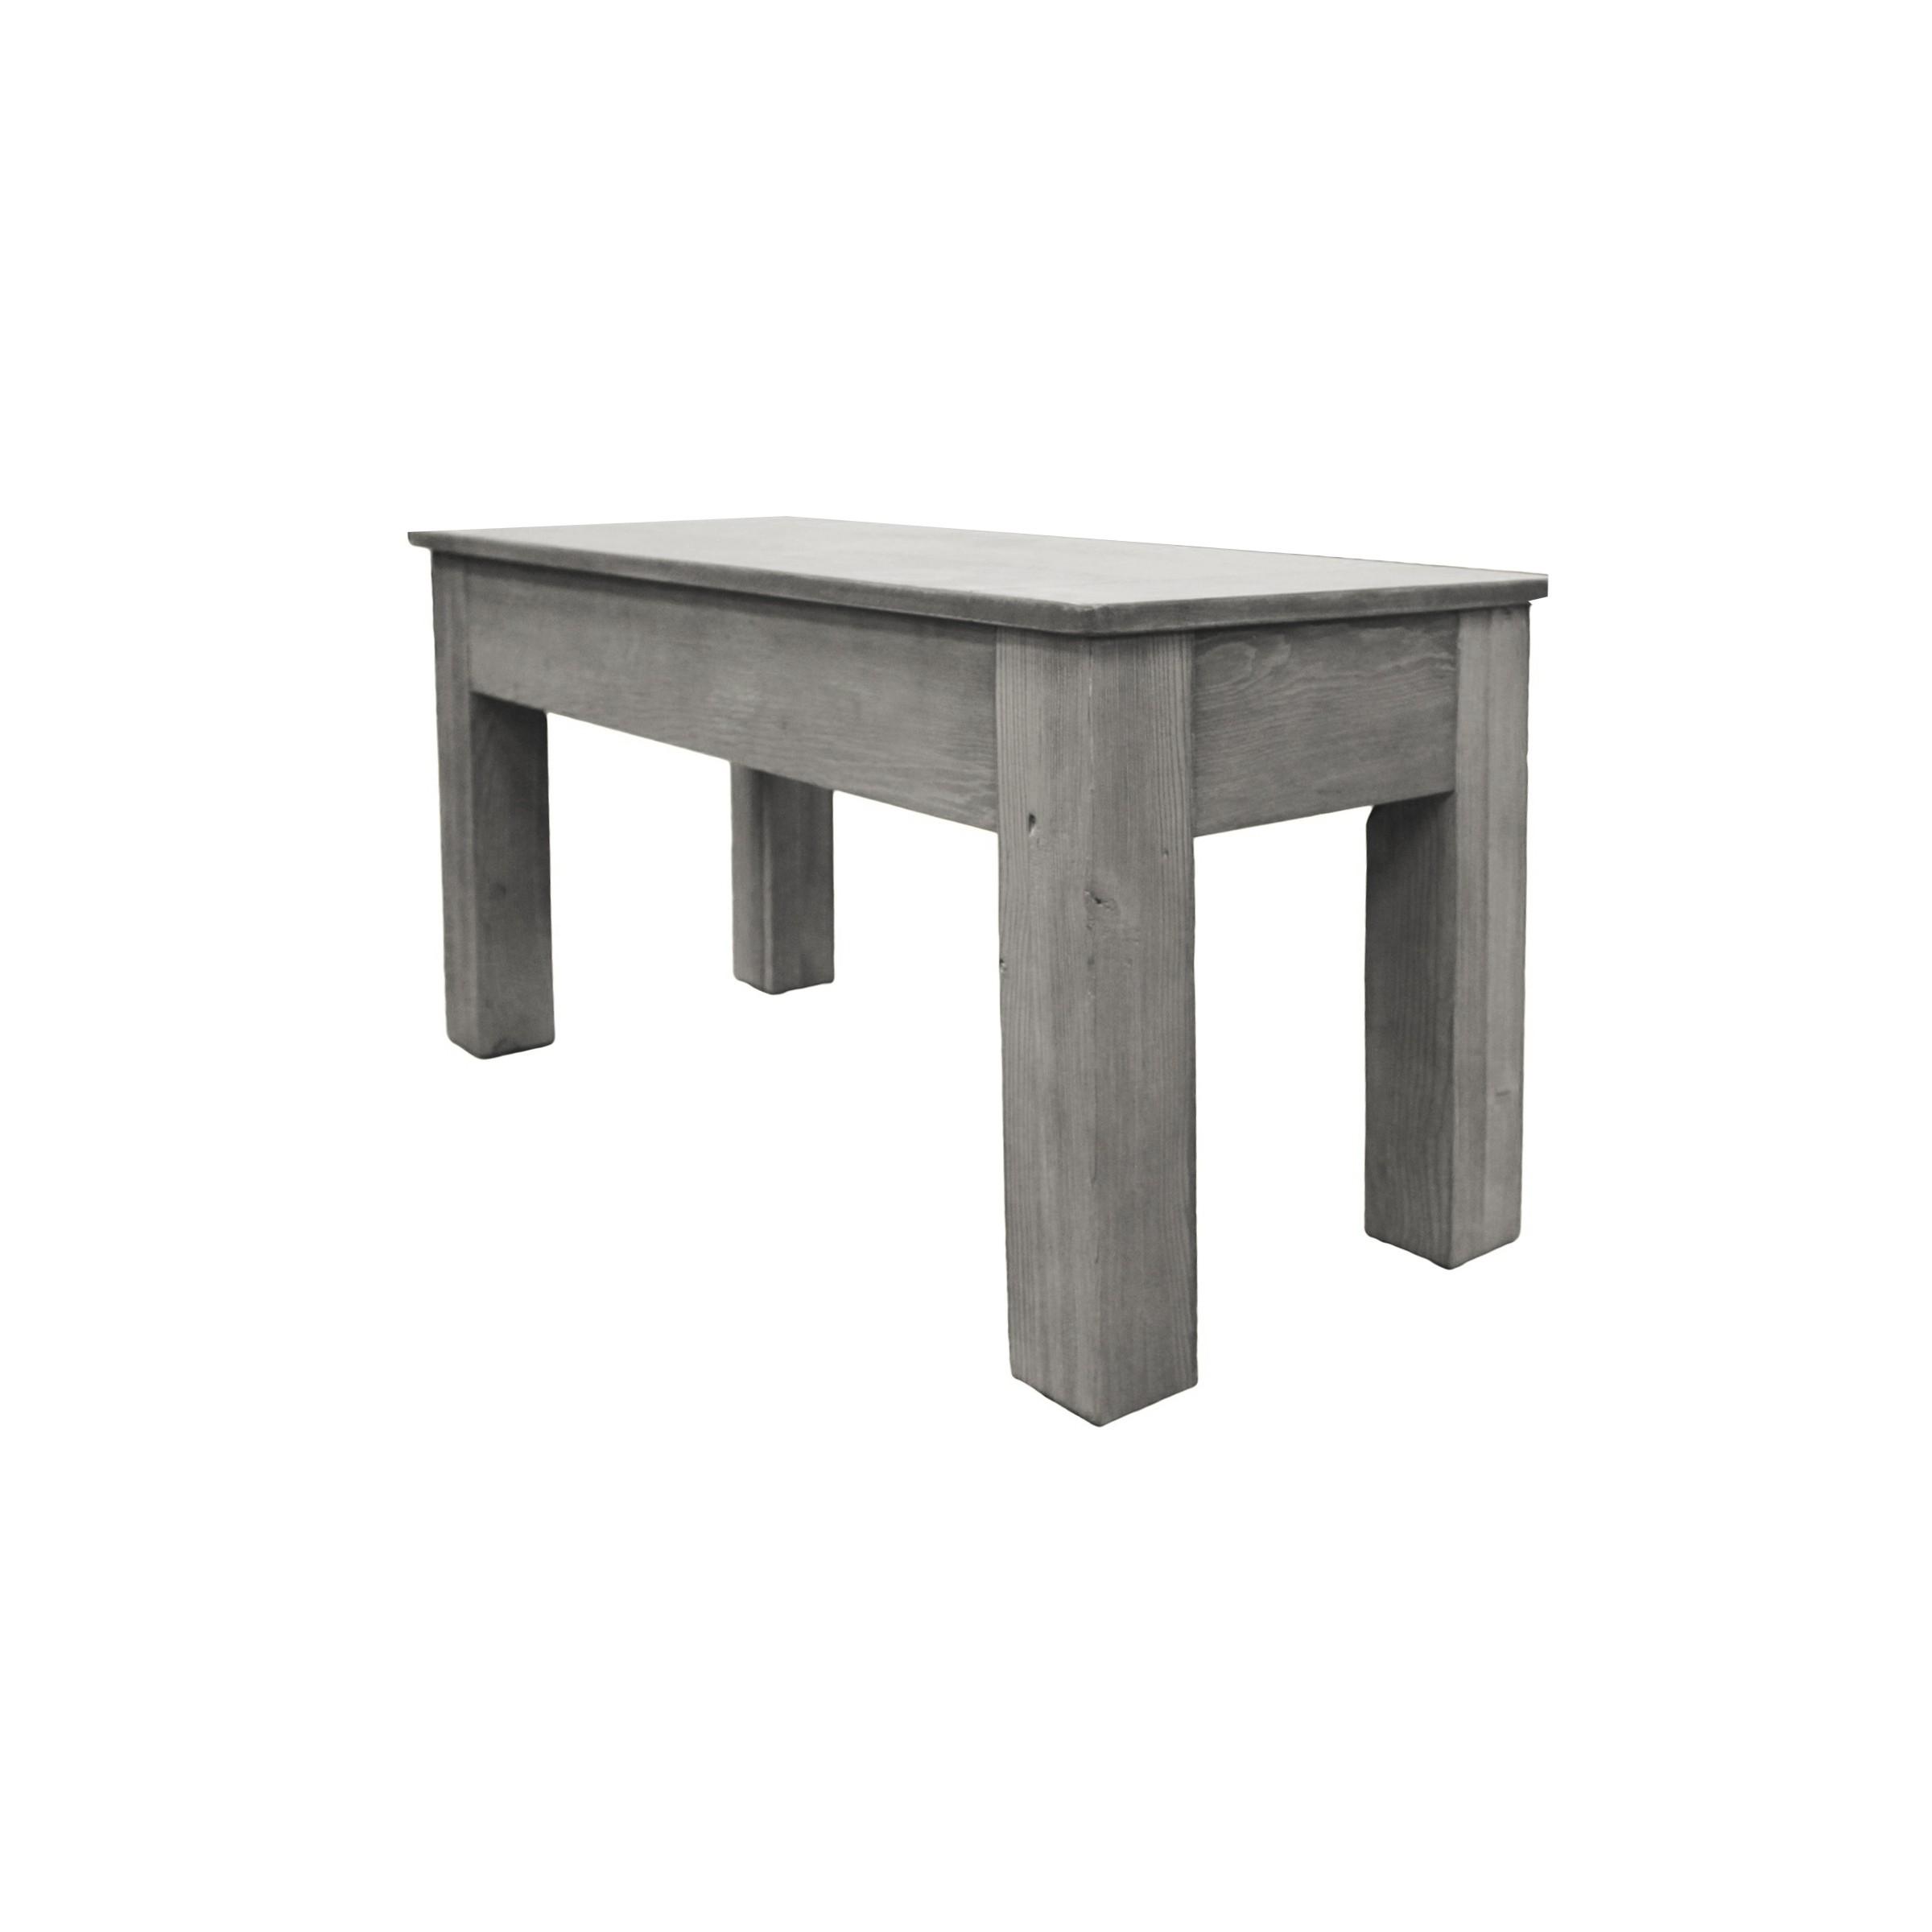 Excellent 36 Inch Long Bench Silver Mist Machost Co Dining Chair Design Ideas Machostcouk